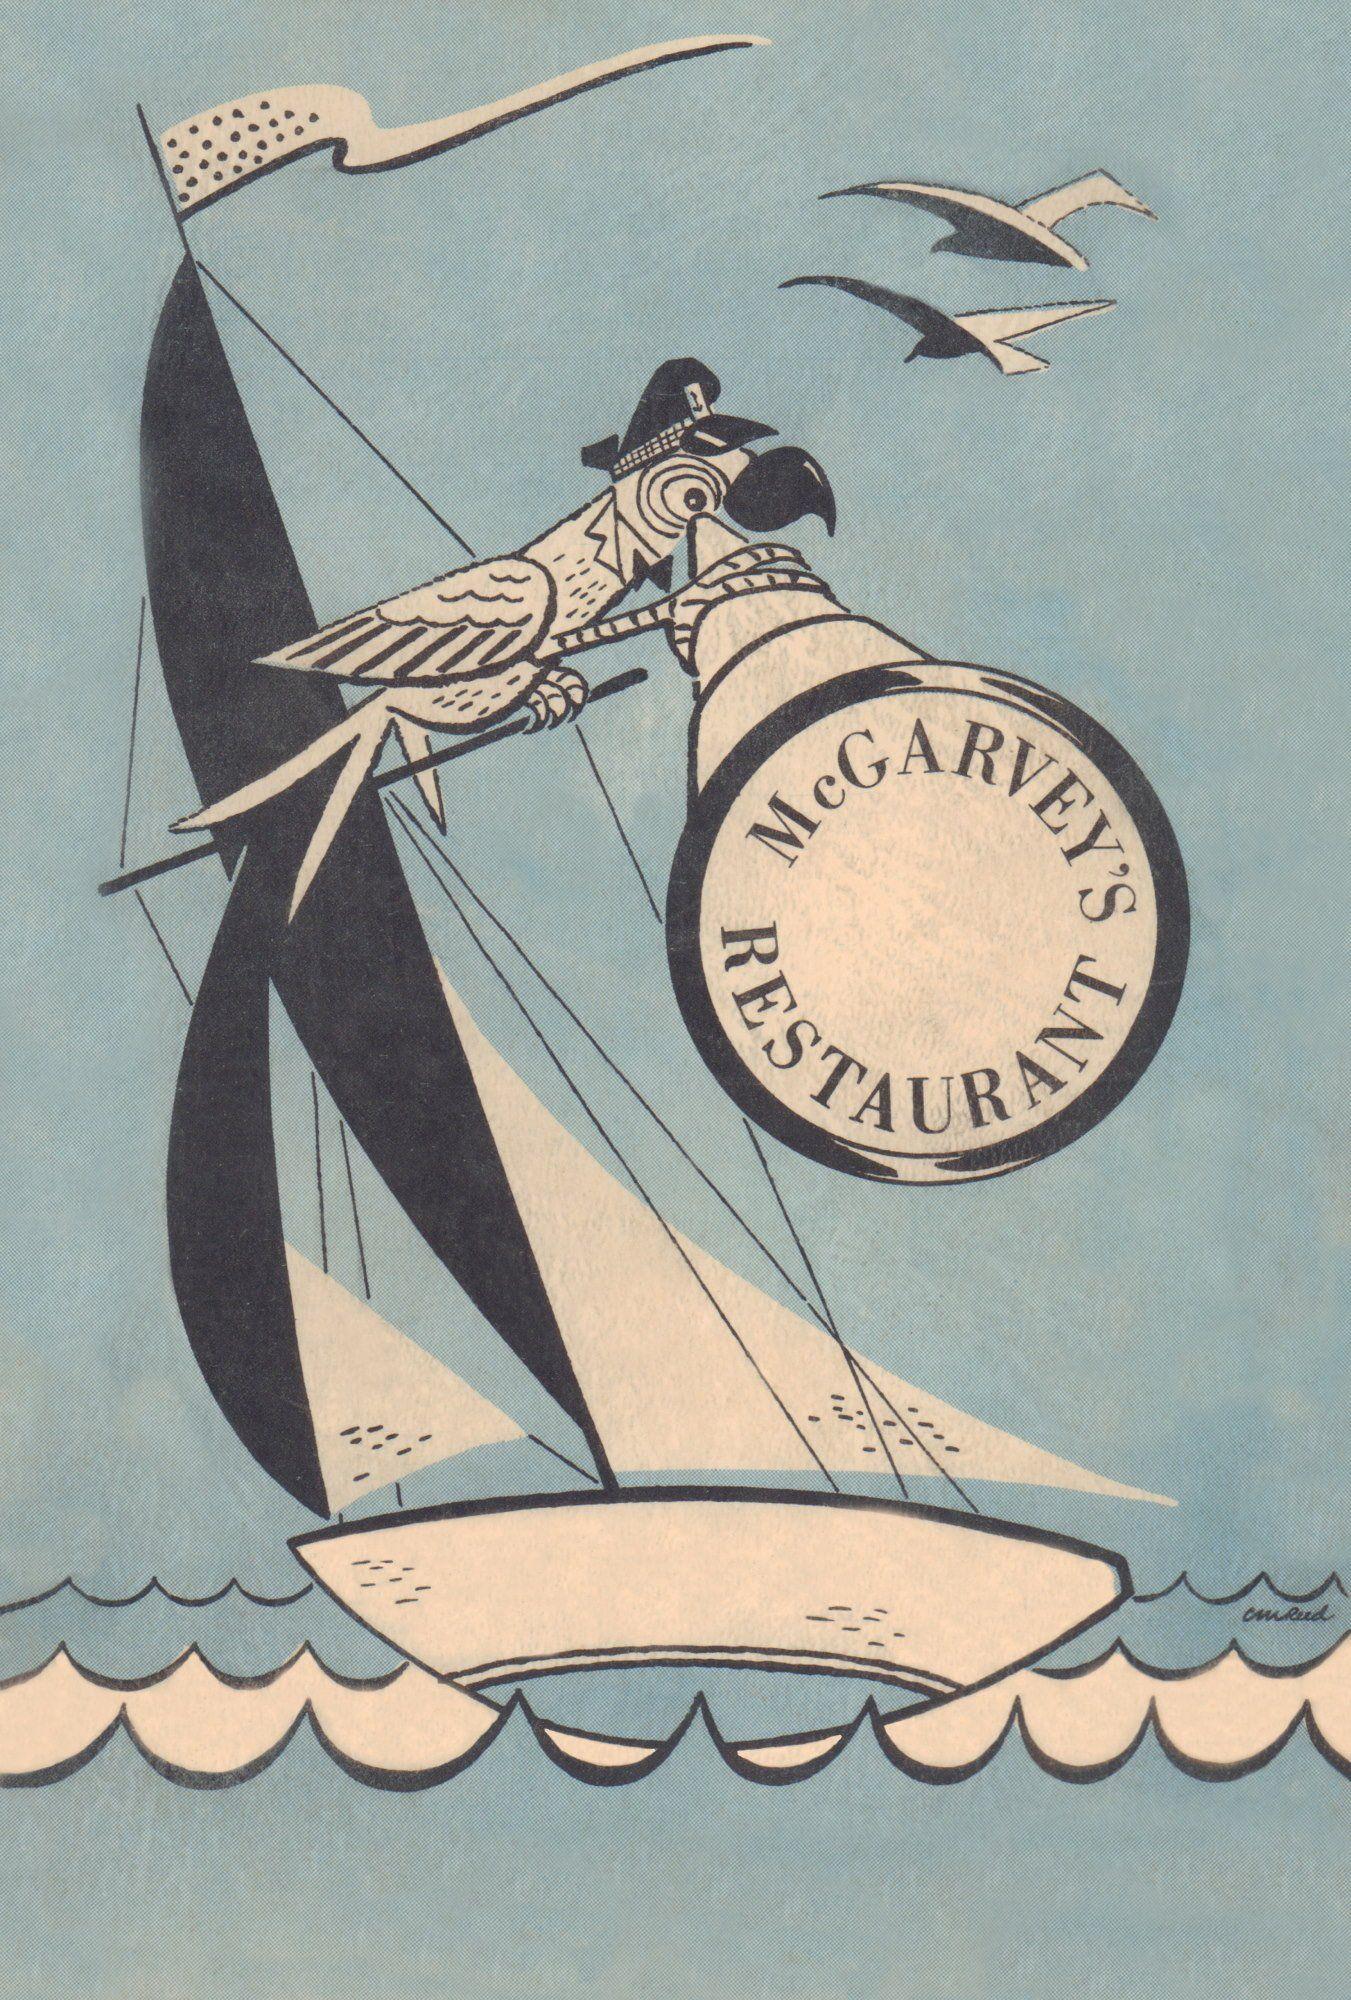 McGarvey's, Vermilion OH, 1930s - 24x36 Archival Print (Unframed) $135.00